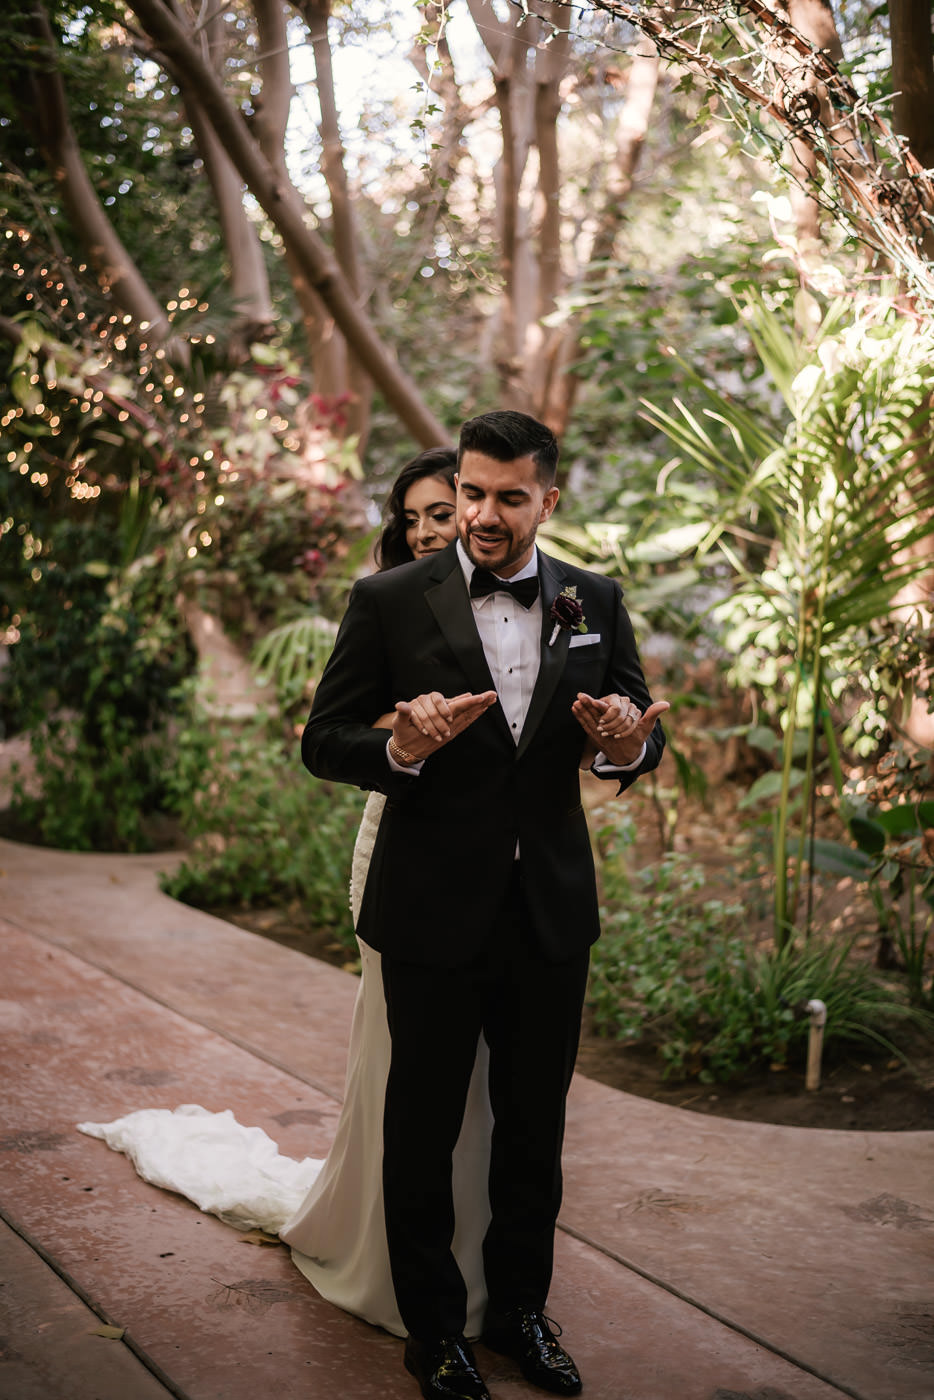 eden-gardens-wedding-photographer-romantic-26.jpg